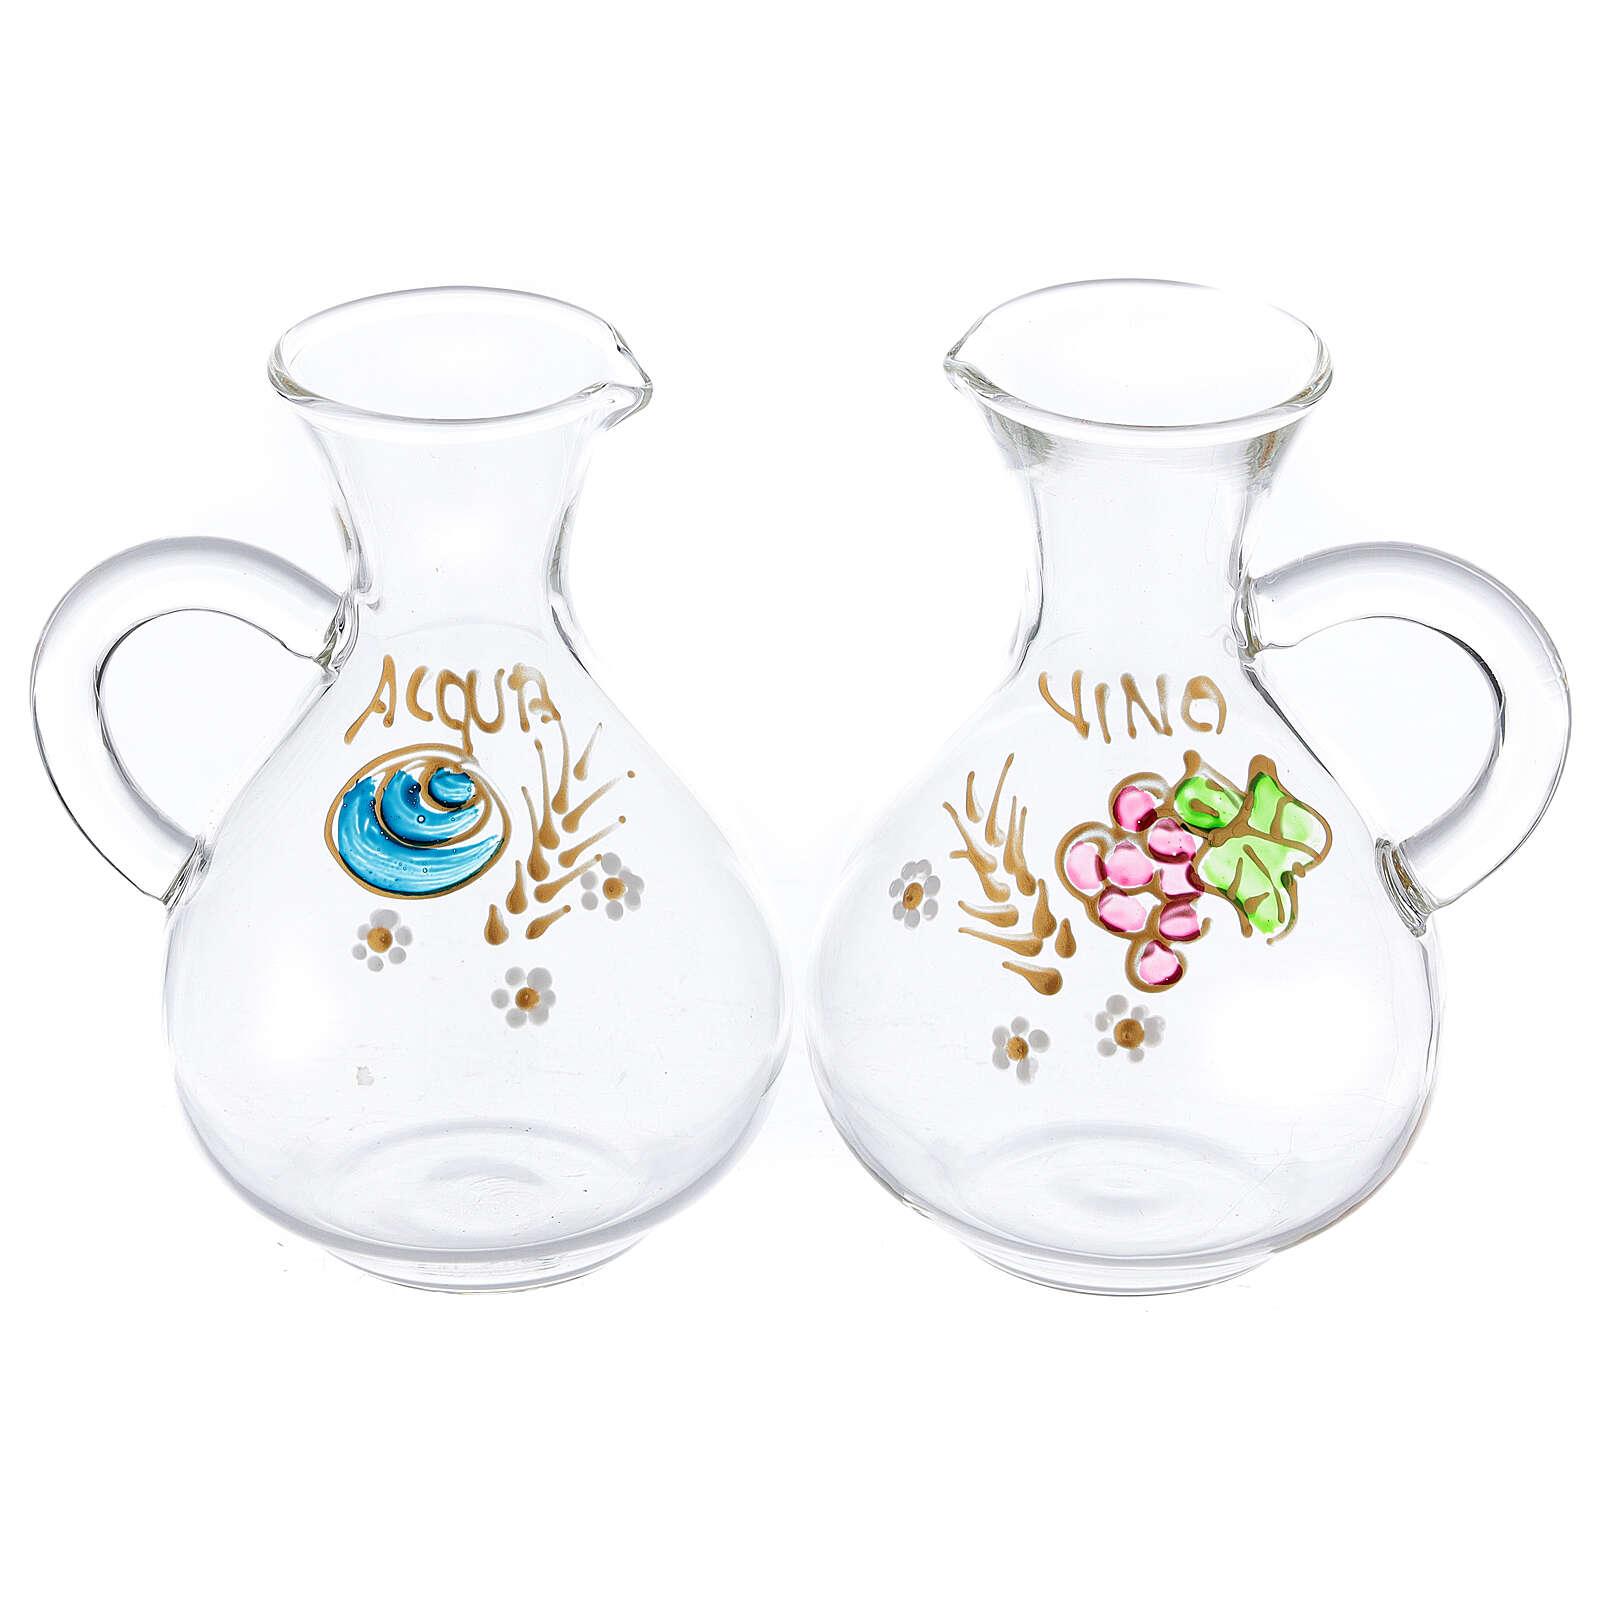 Vinajeras agua y vino Palermo de vidrio pintado a mano ml 140 4